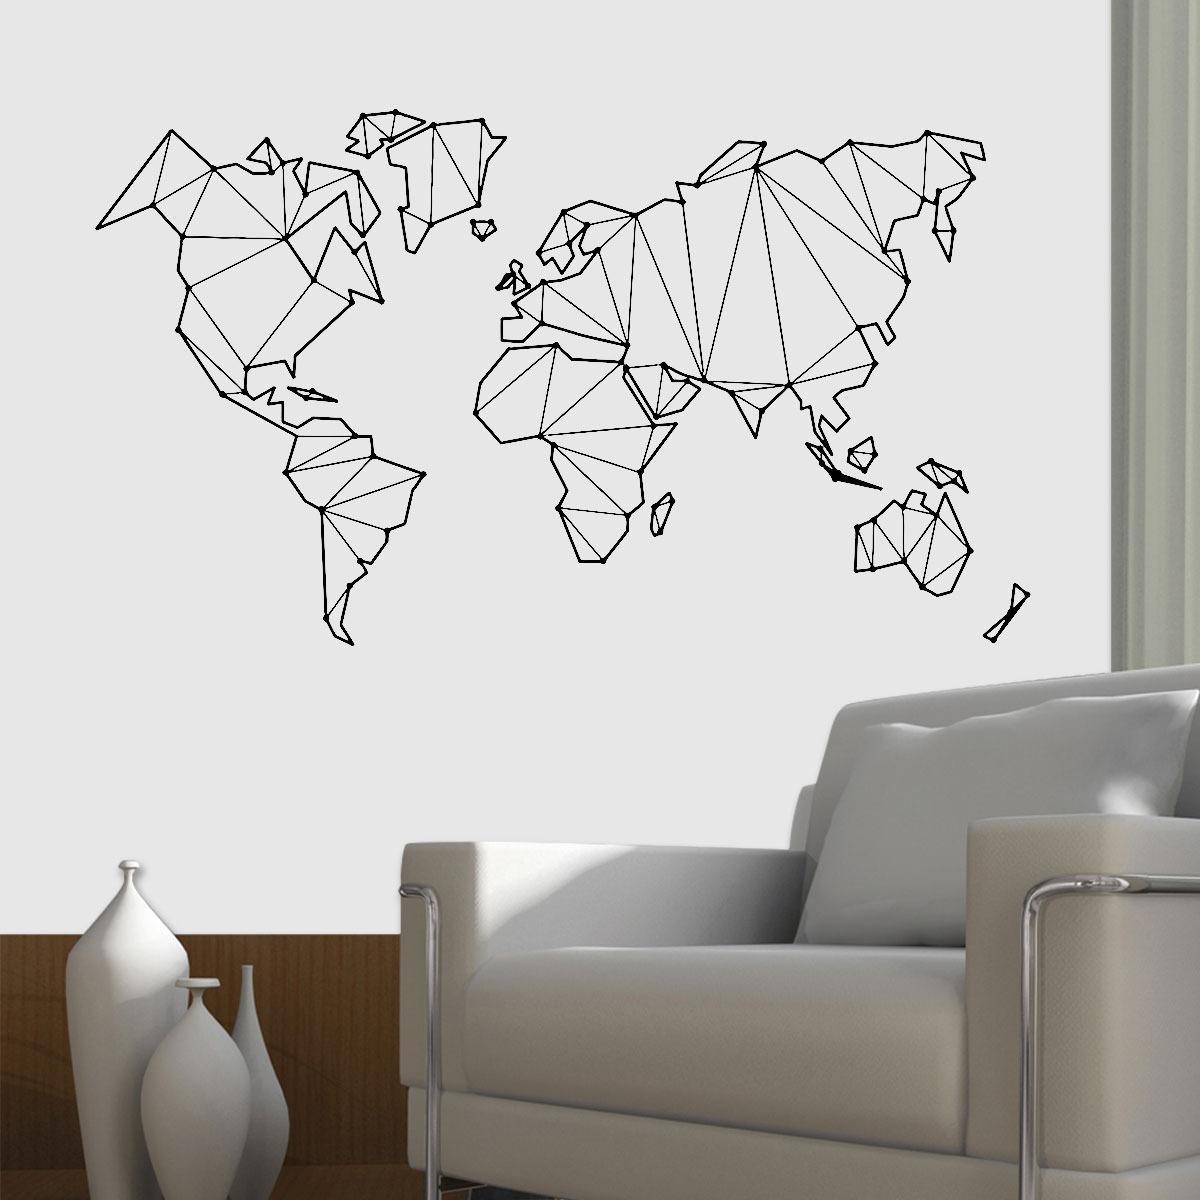 Adesivo De Parede Mapa Mundi Origami Extra Grande 146x75cm R